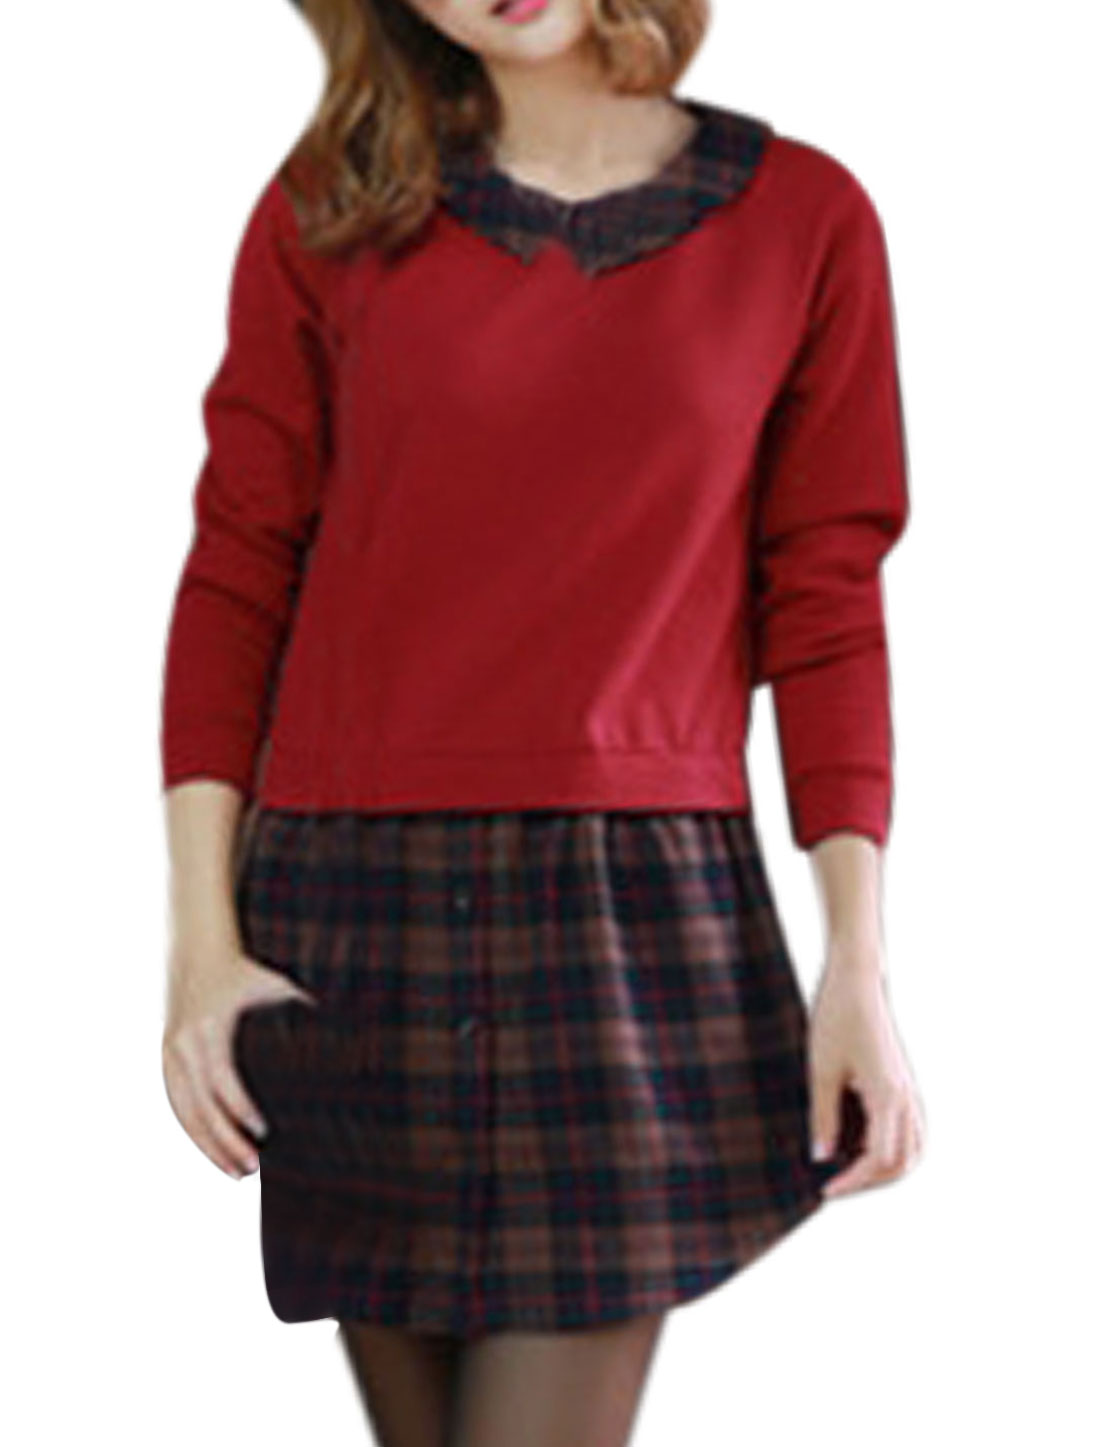 Ladies Panel Design Long Sleeves Plaids Warm Red Dress M